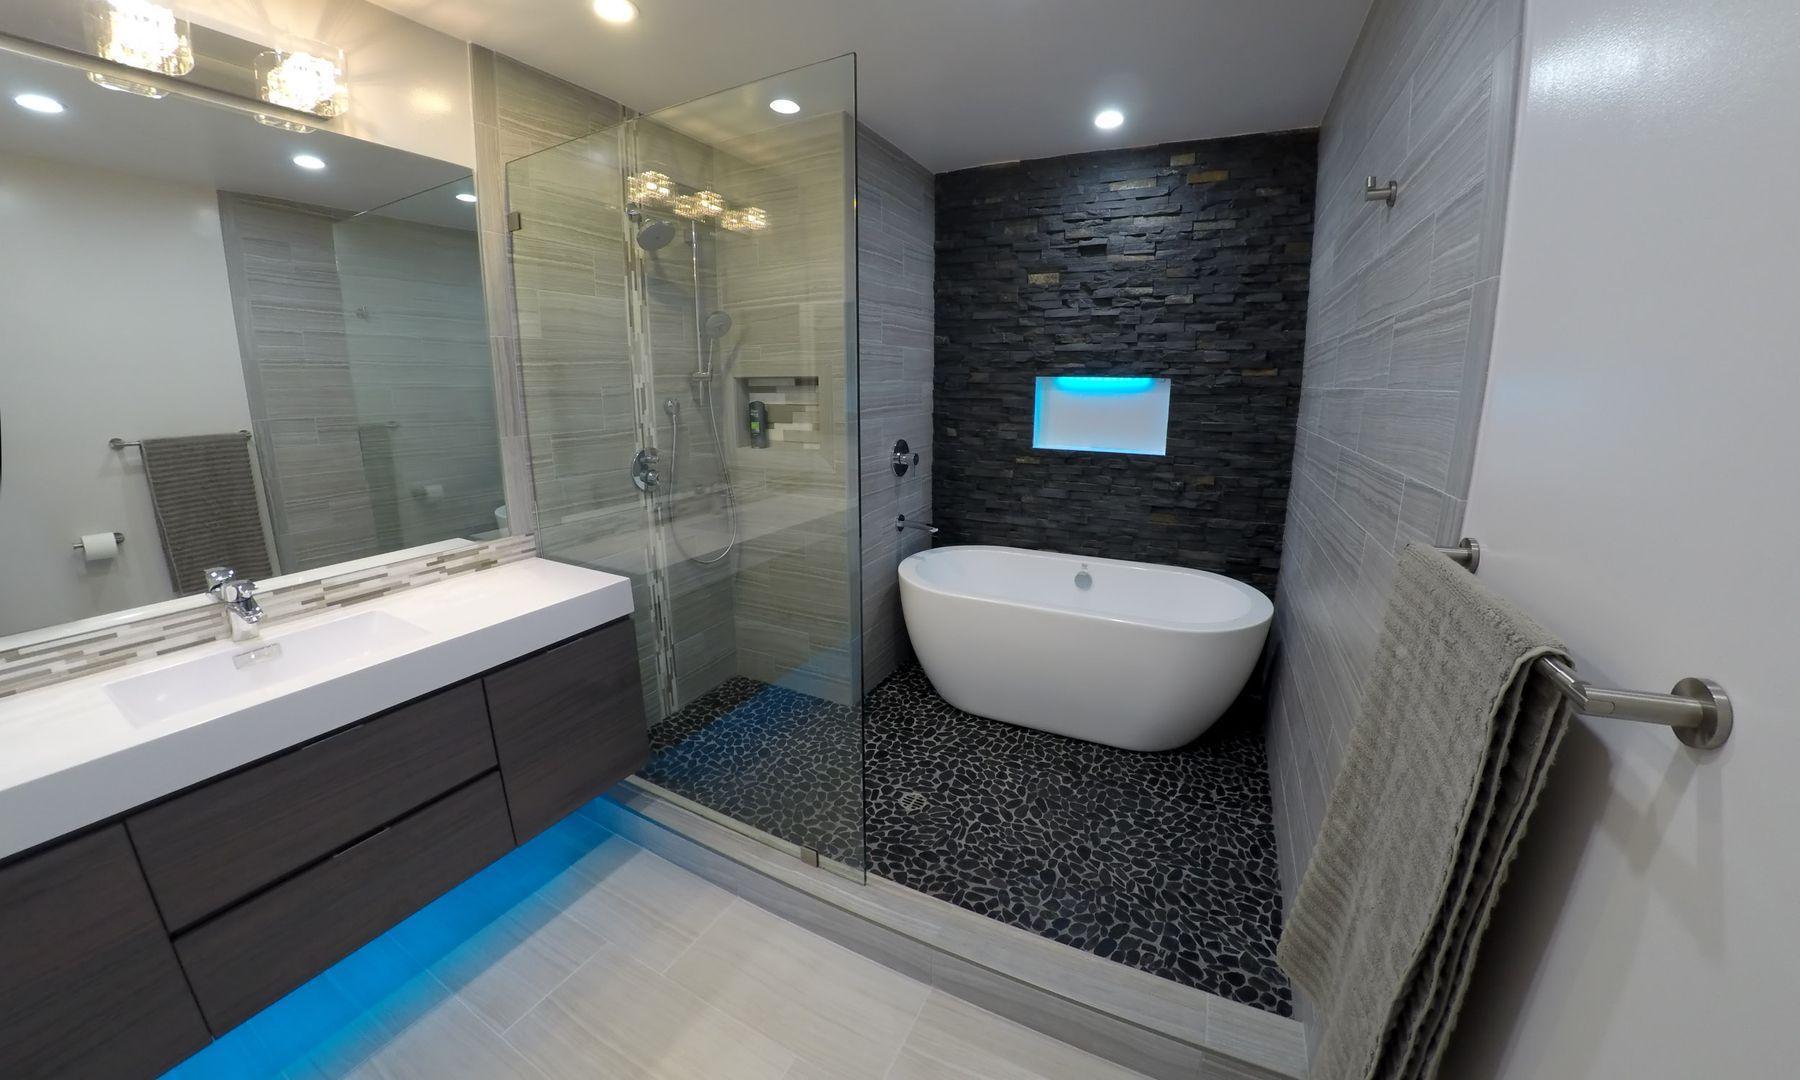 Quality Bathroom Renovation Bathroom Remodeling In Omaha Eppley Handyman Services Bathroom Remodel Cost Diy Bathroom Remodel Bathrooms Remodel